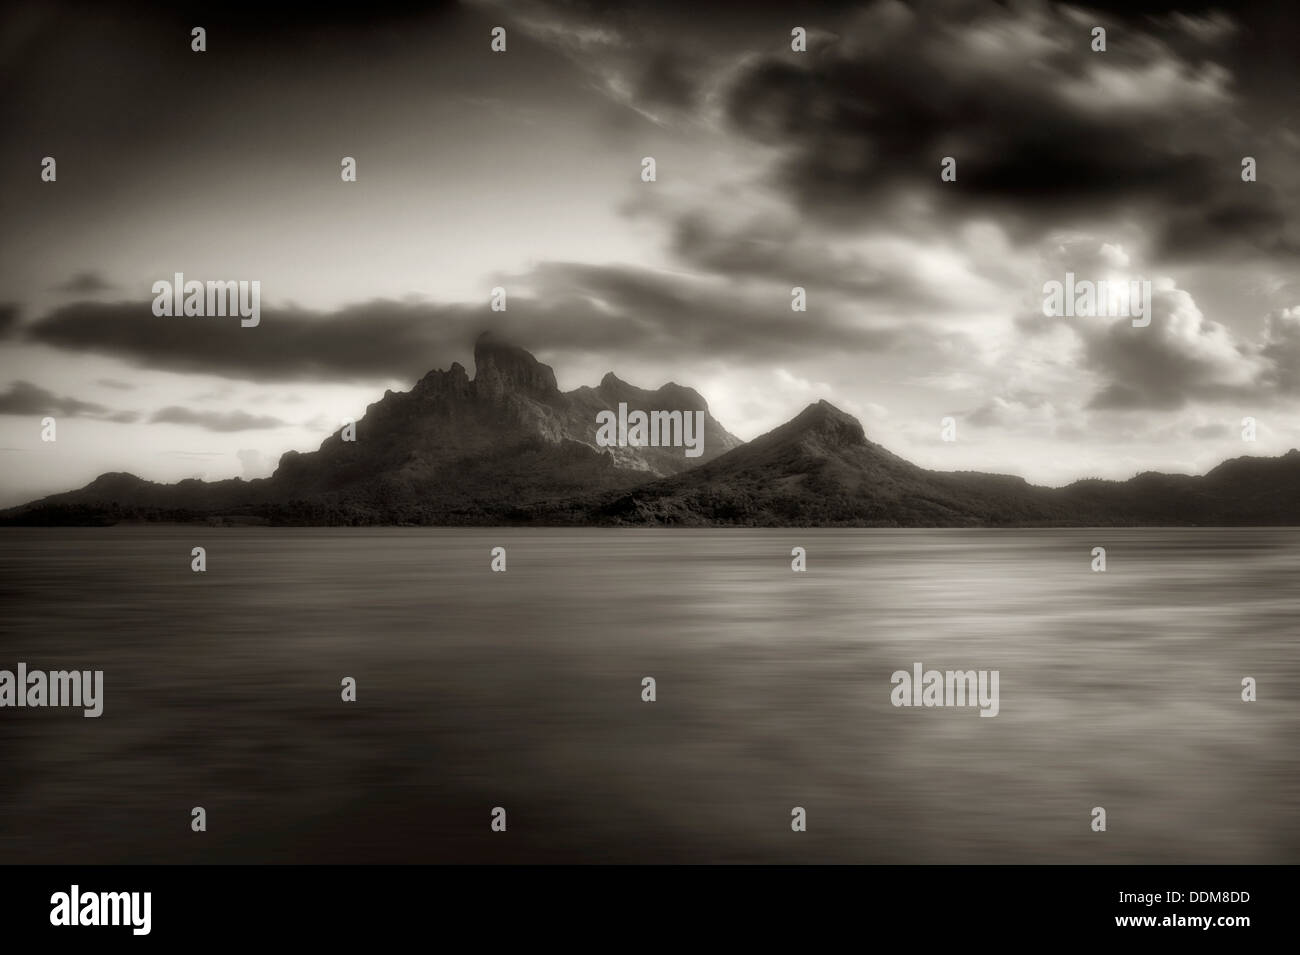 Mt. Otemanu at sunset. Bora Bora. French Polynesia. - Stock Image